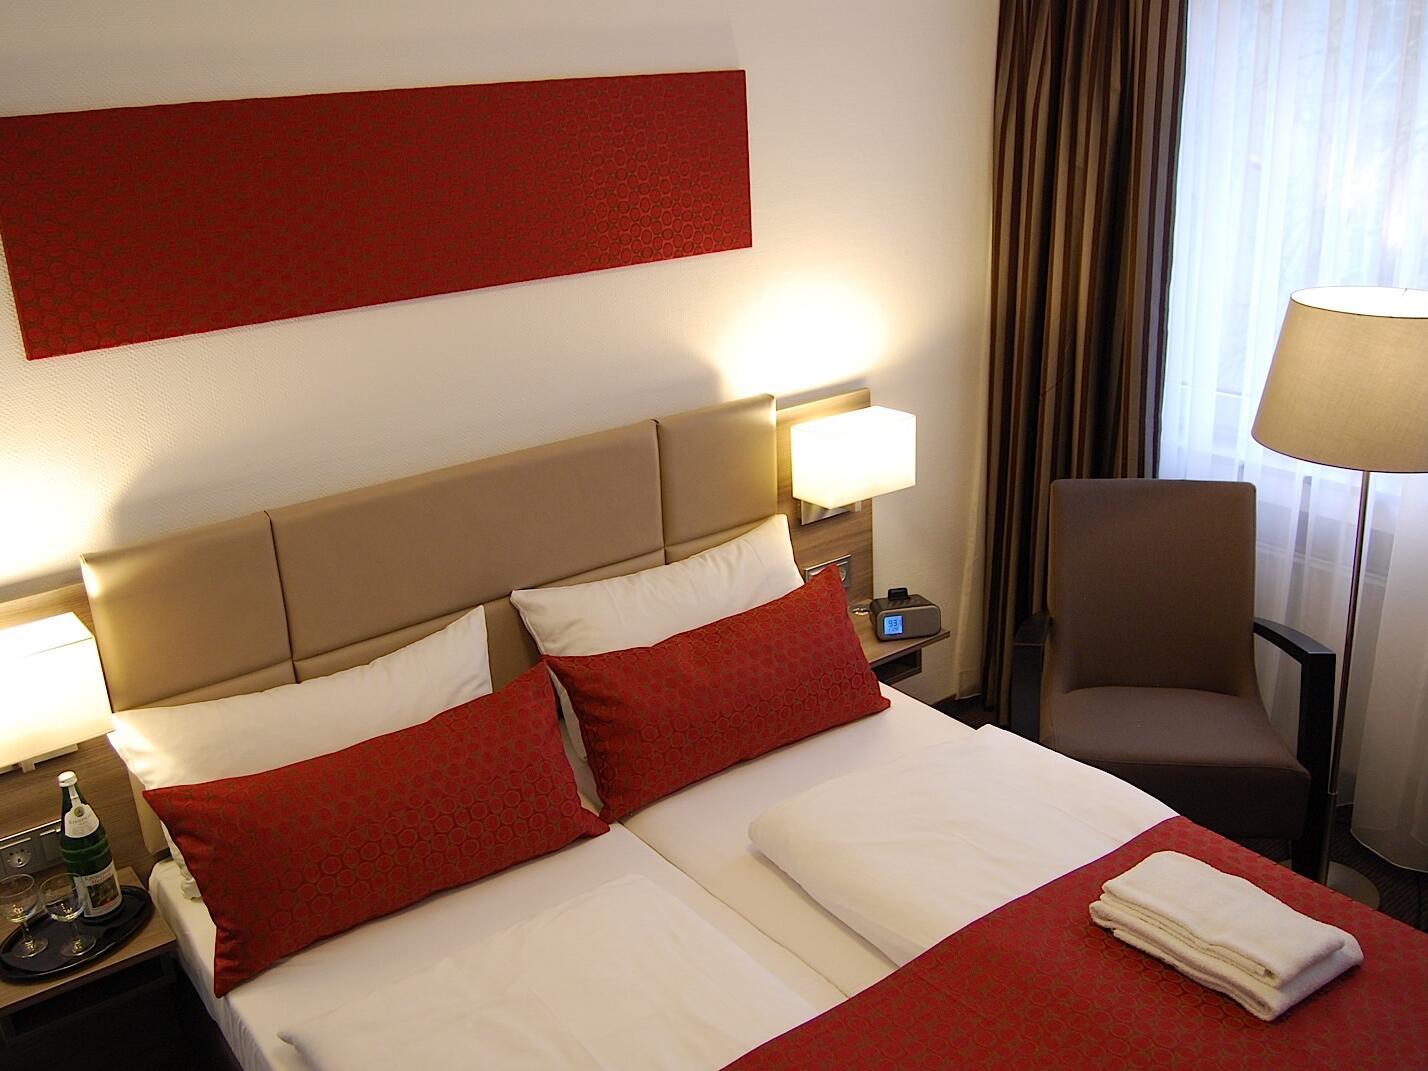 Comfy bed-Dom Hotel Am Roemerbrunnen